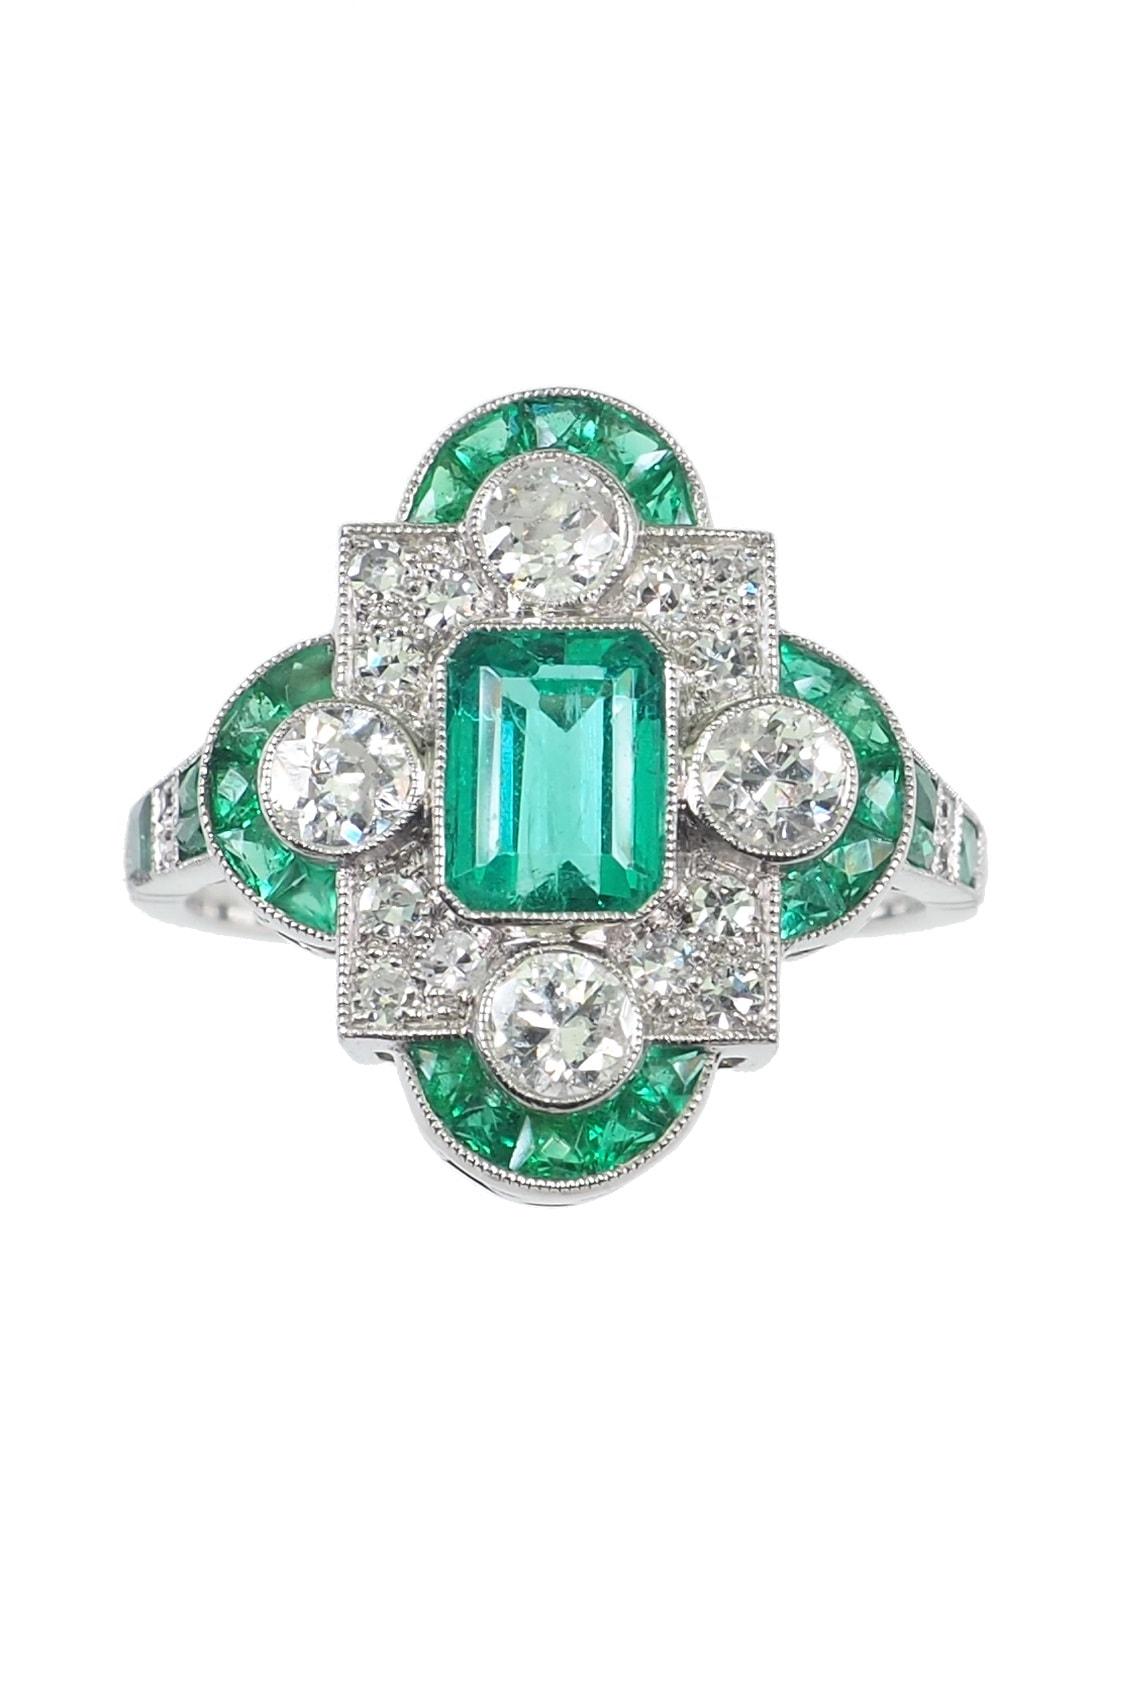 Art-deco-Smaragdring-kaufen-2698